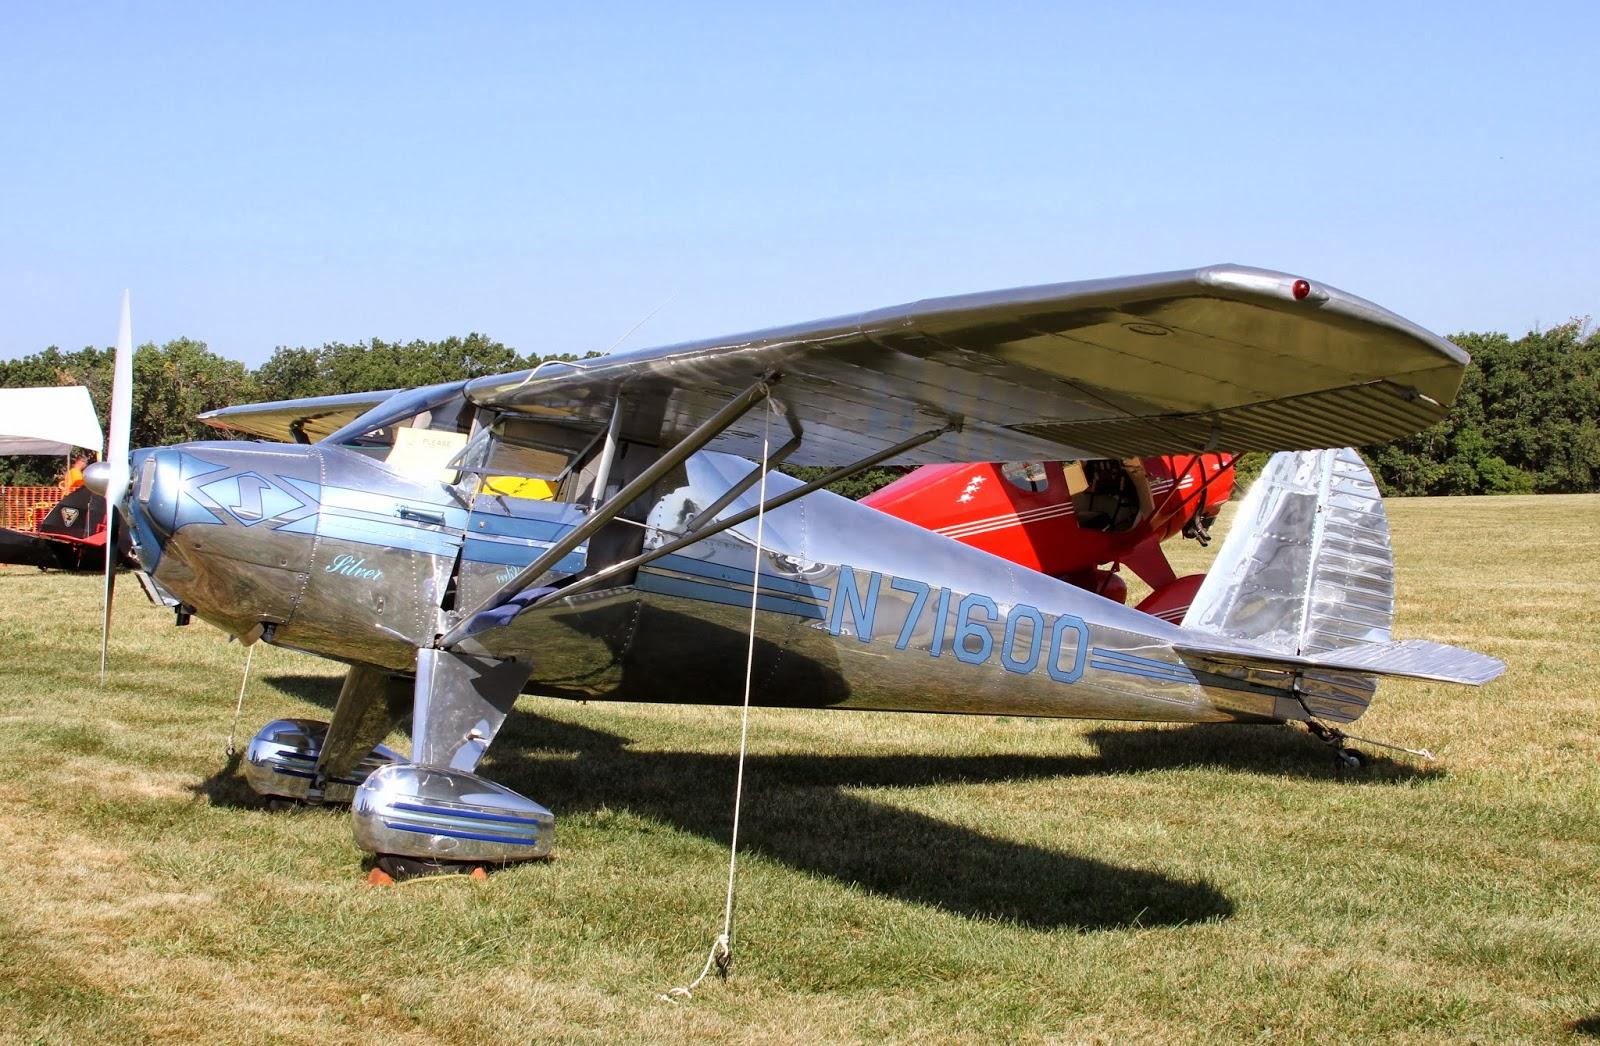 The Aero Experience: Antique Airplane Association Celebrates